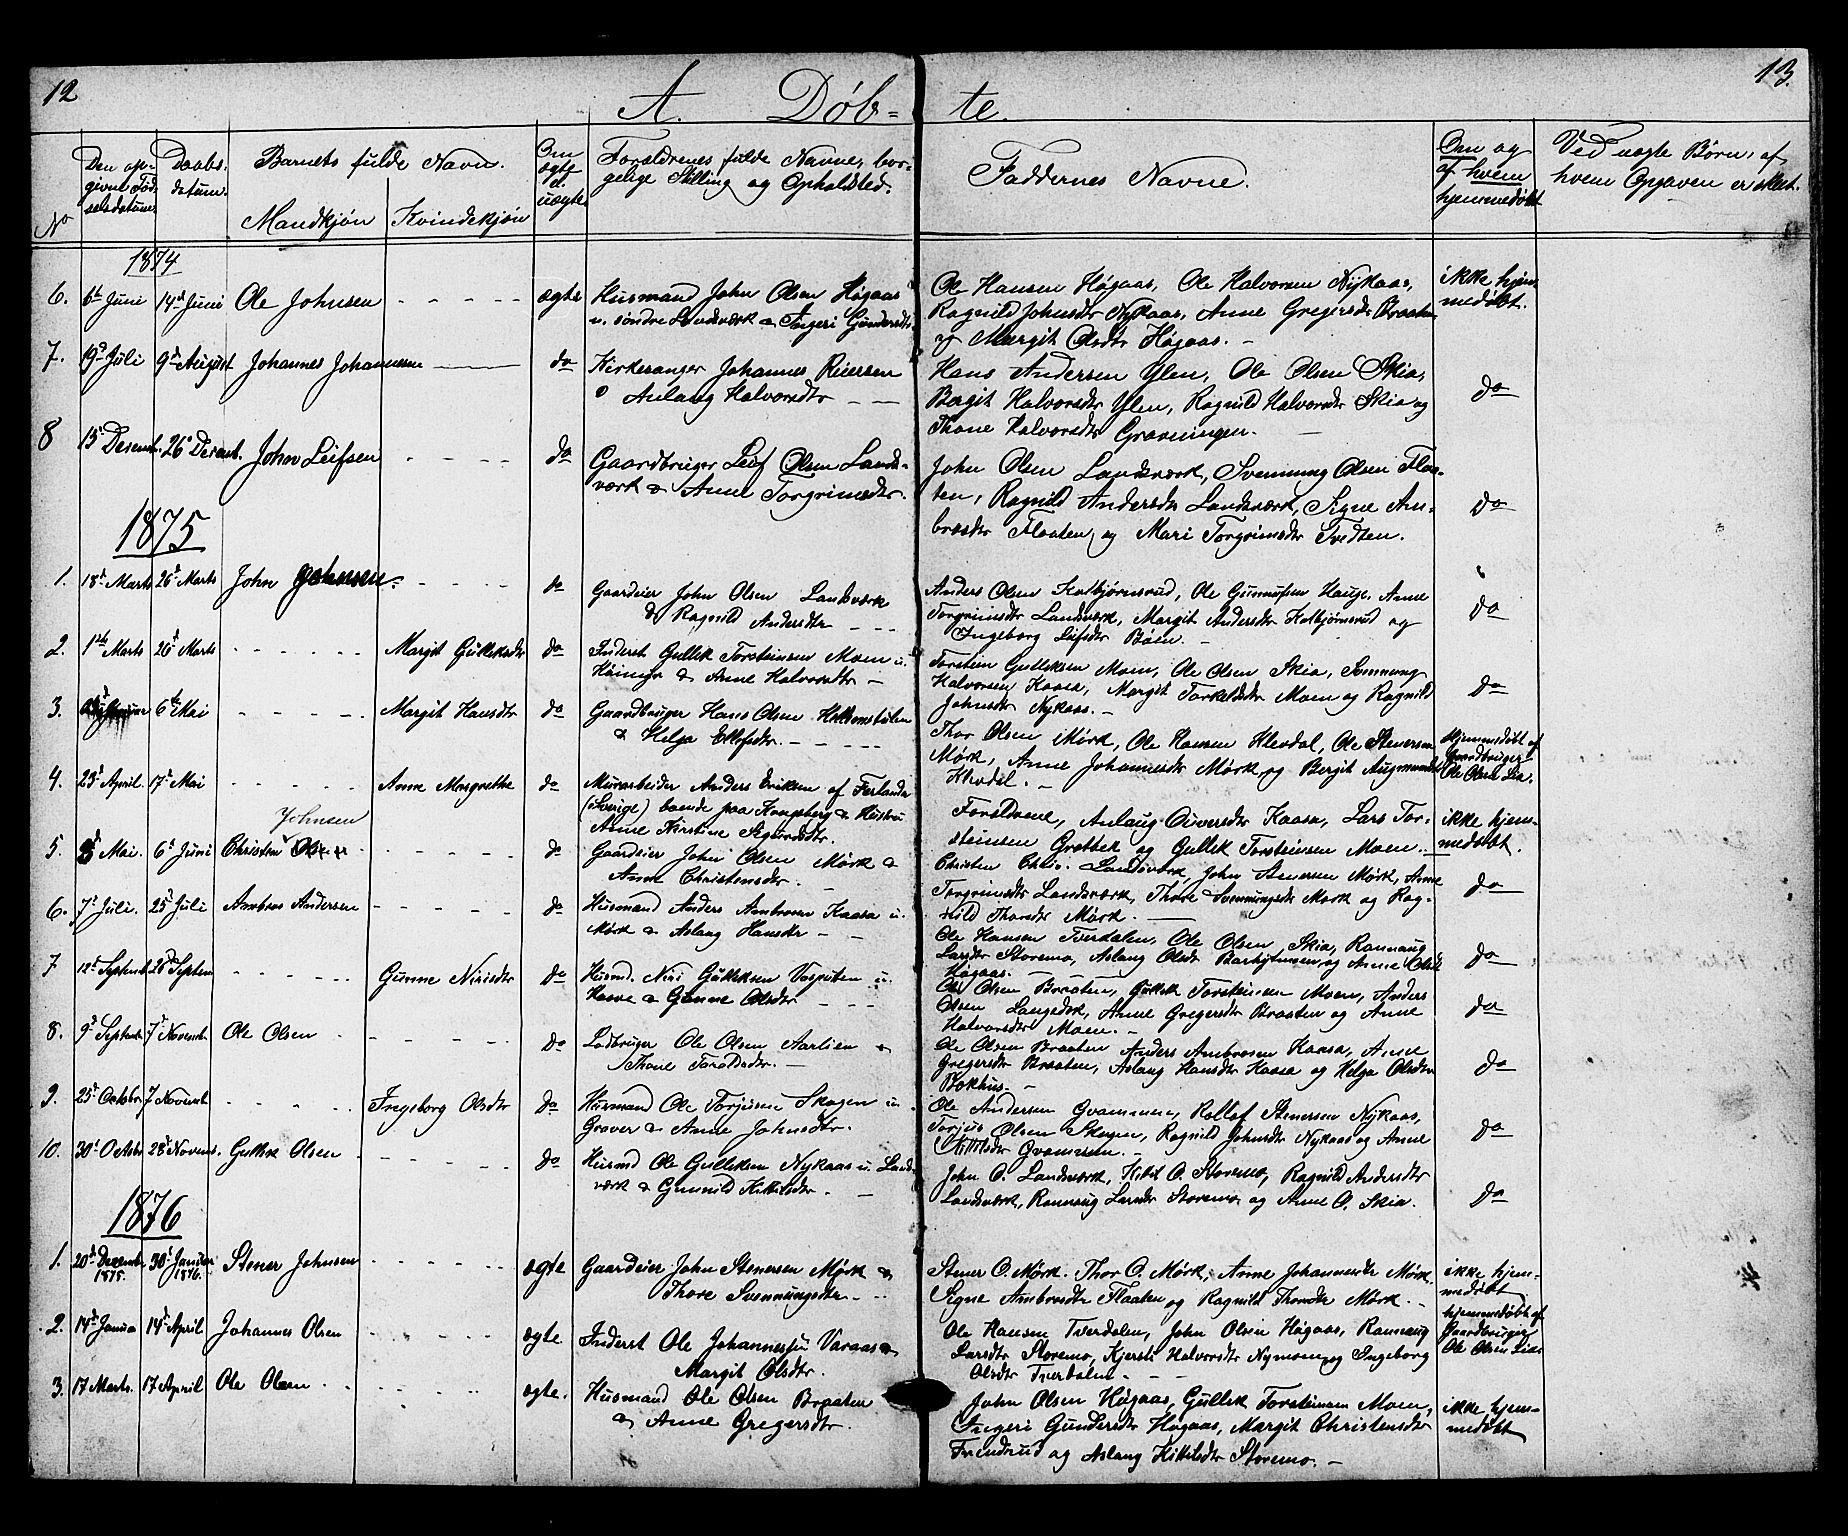 SAKO, Heddal kirkebøker, G/Gb/L0001: Klokkerbok nr. II 1, 1866-1887, s. 12-13